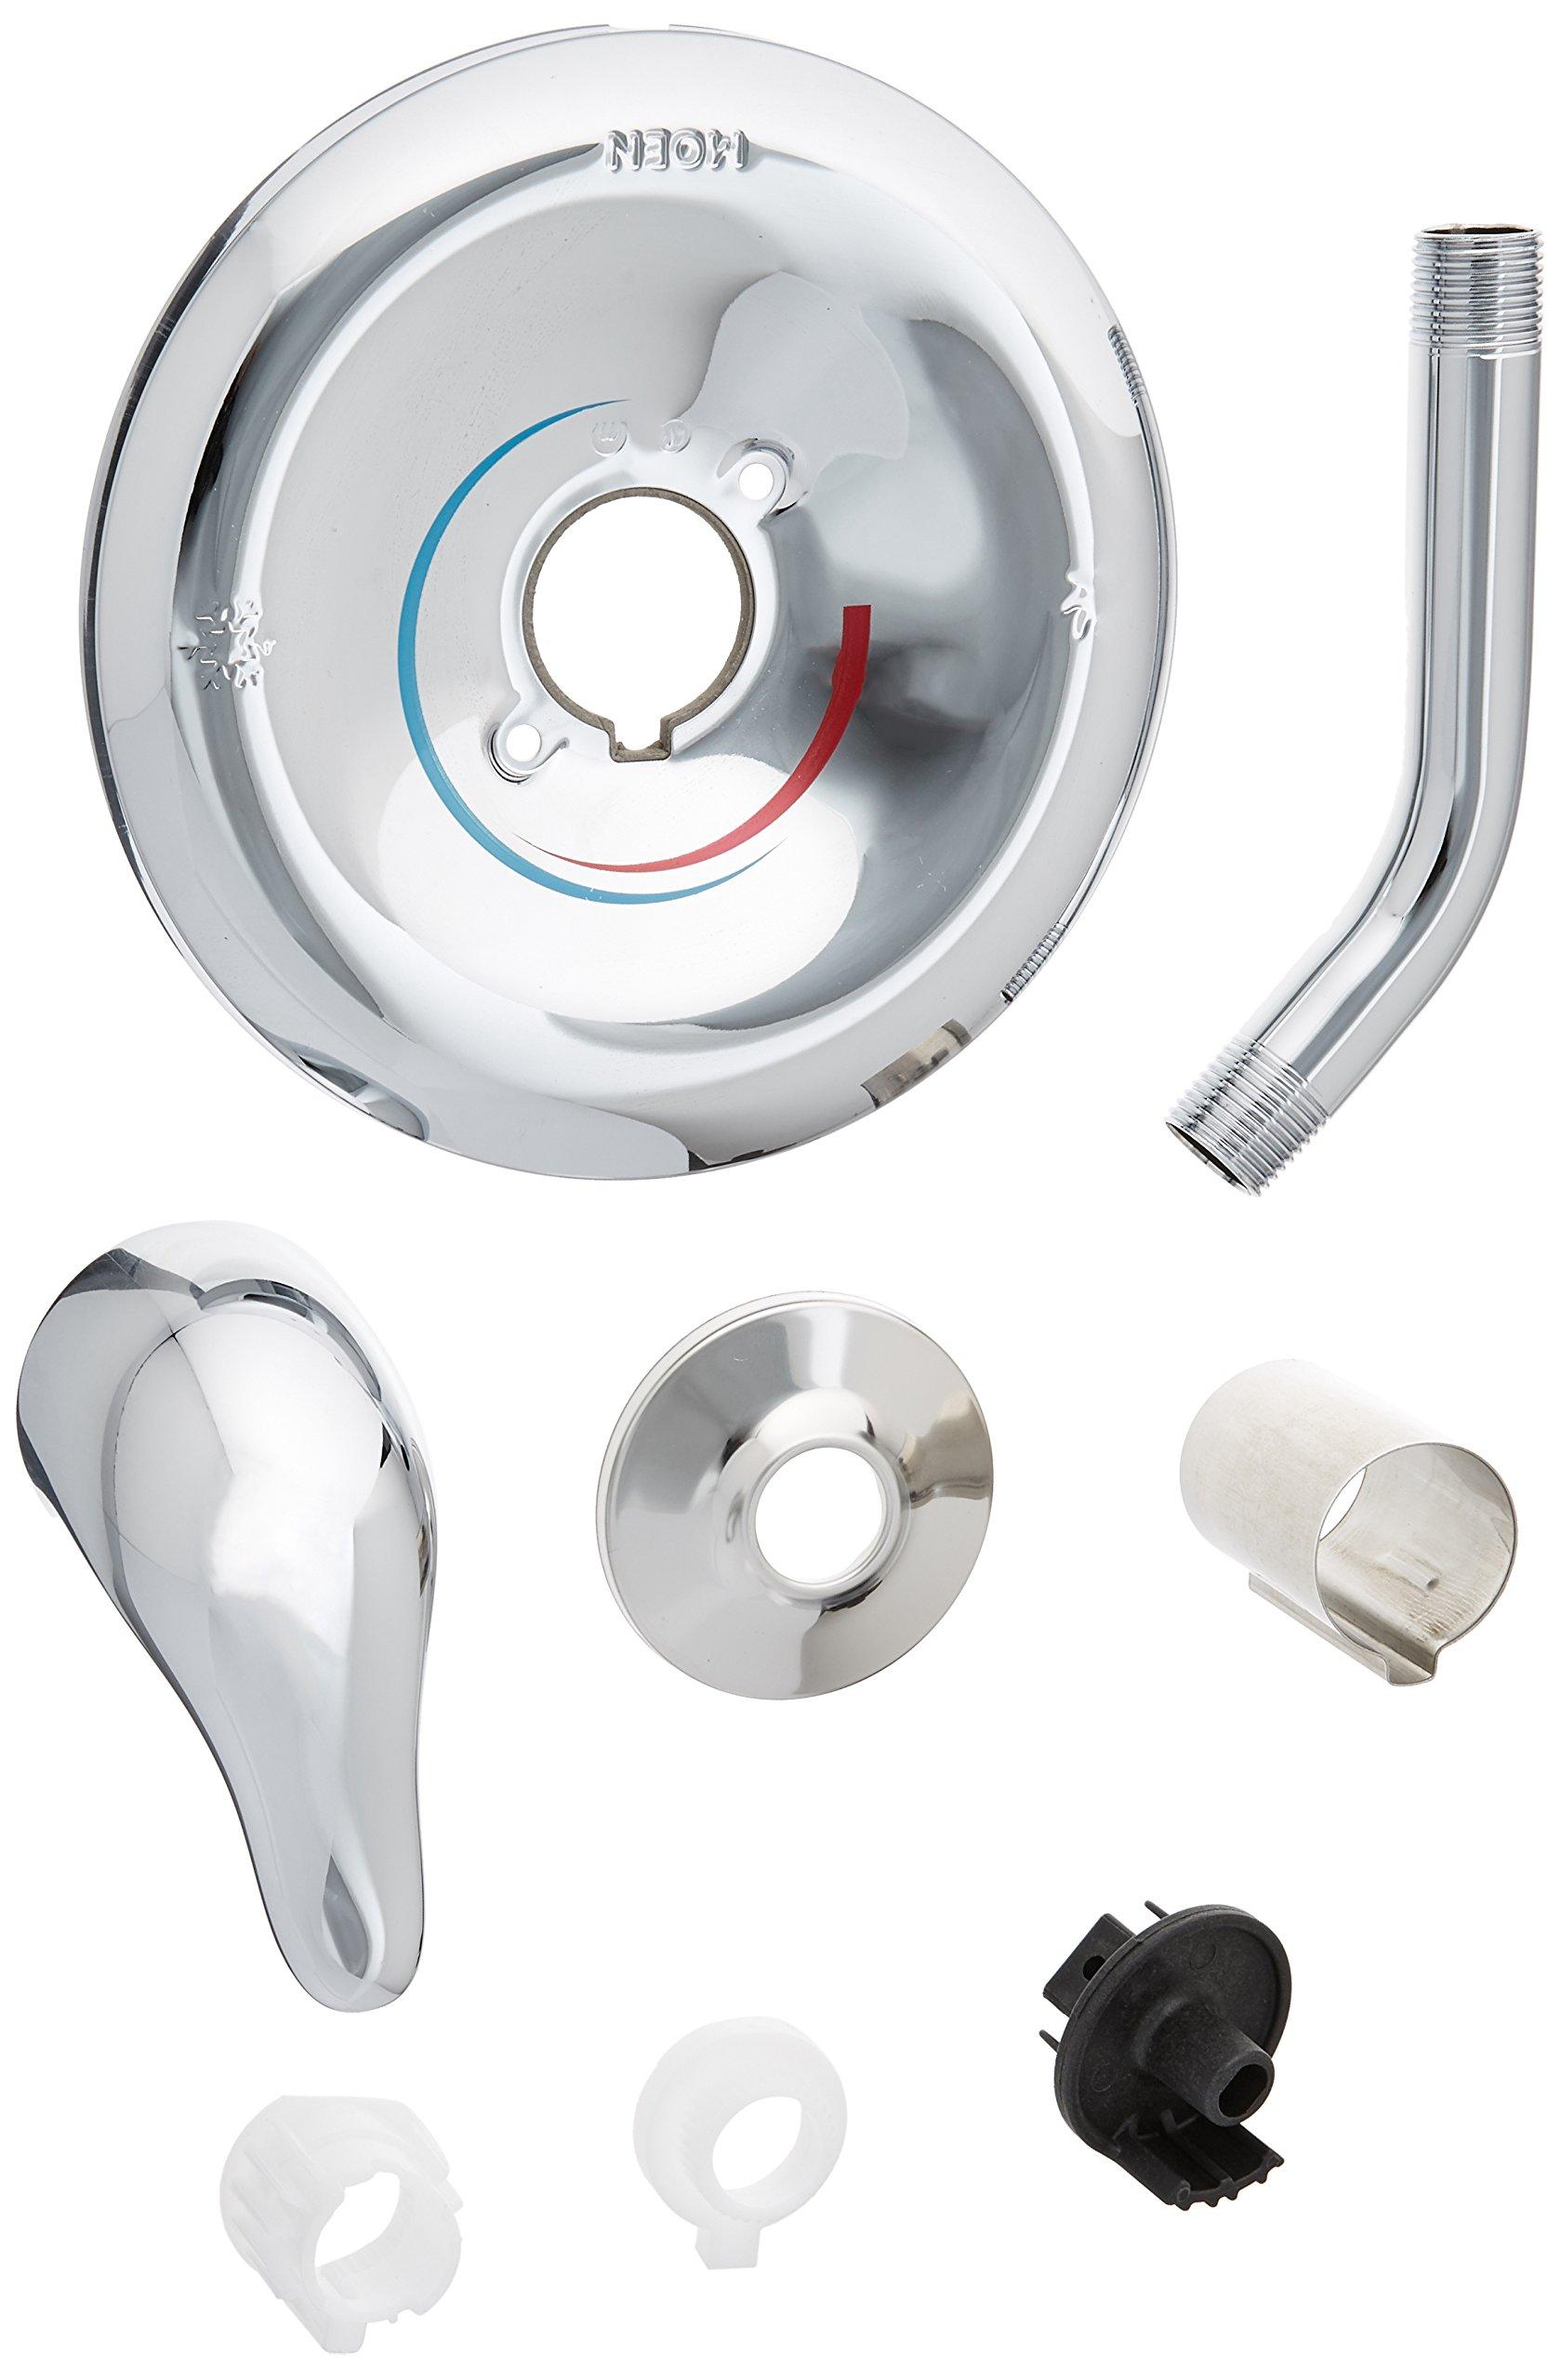 Moen TL182NH Single Handle PosiTemp Pressure Balanced Shower Trim Kit, Chrome